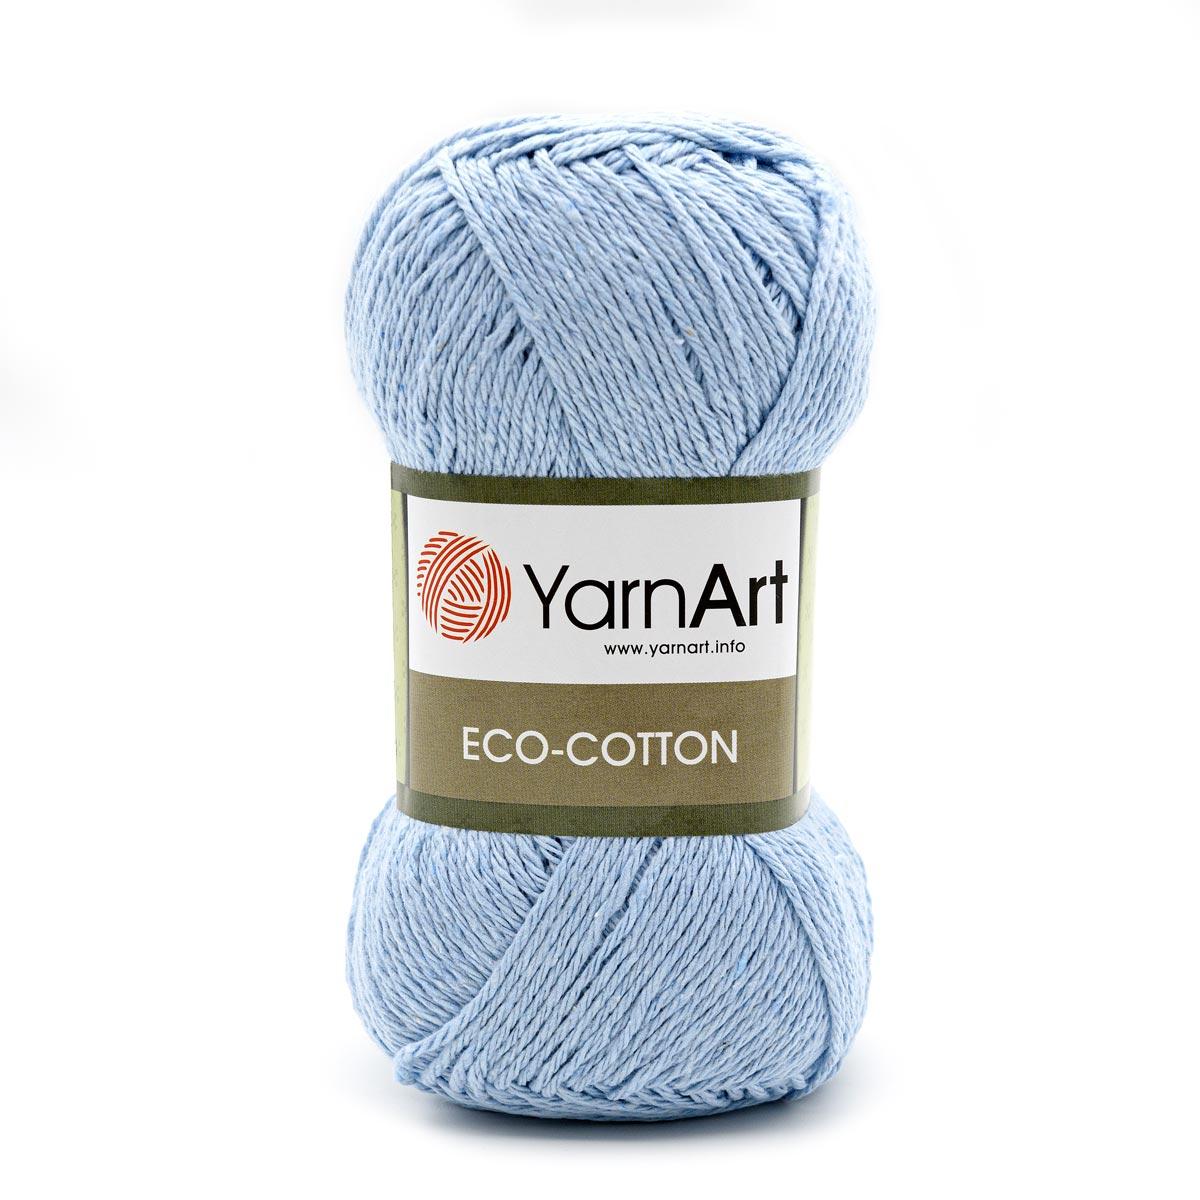 Пряжа YarnArt 'Eco Cotton' 100гр 220м (85% хлопок, 15% полиэстер)